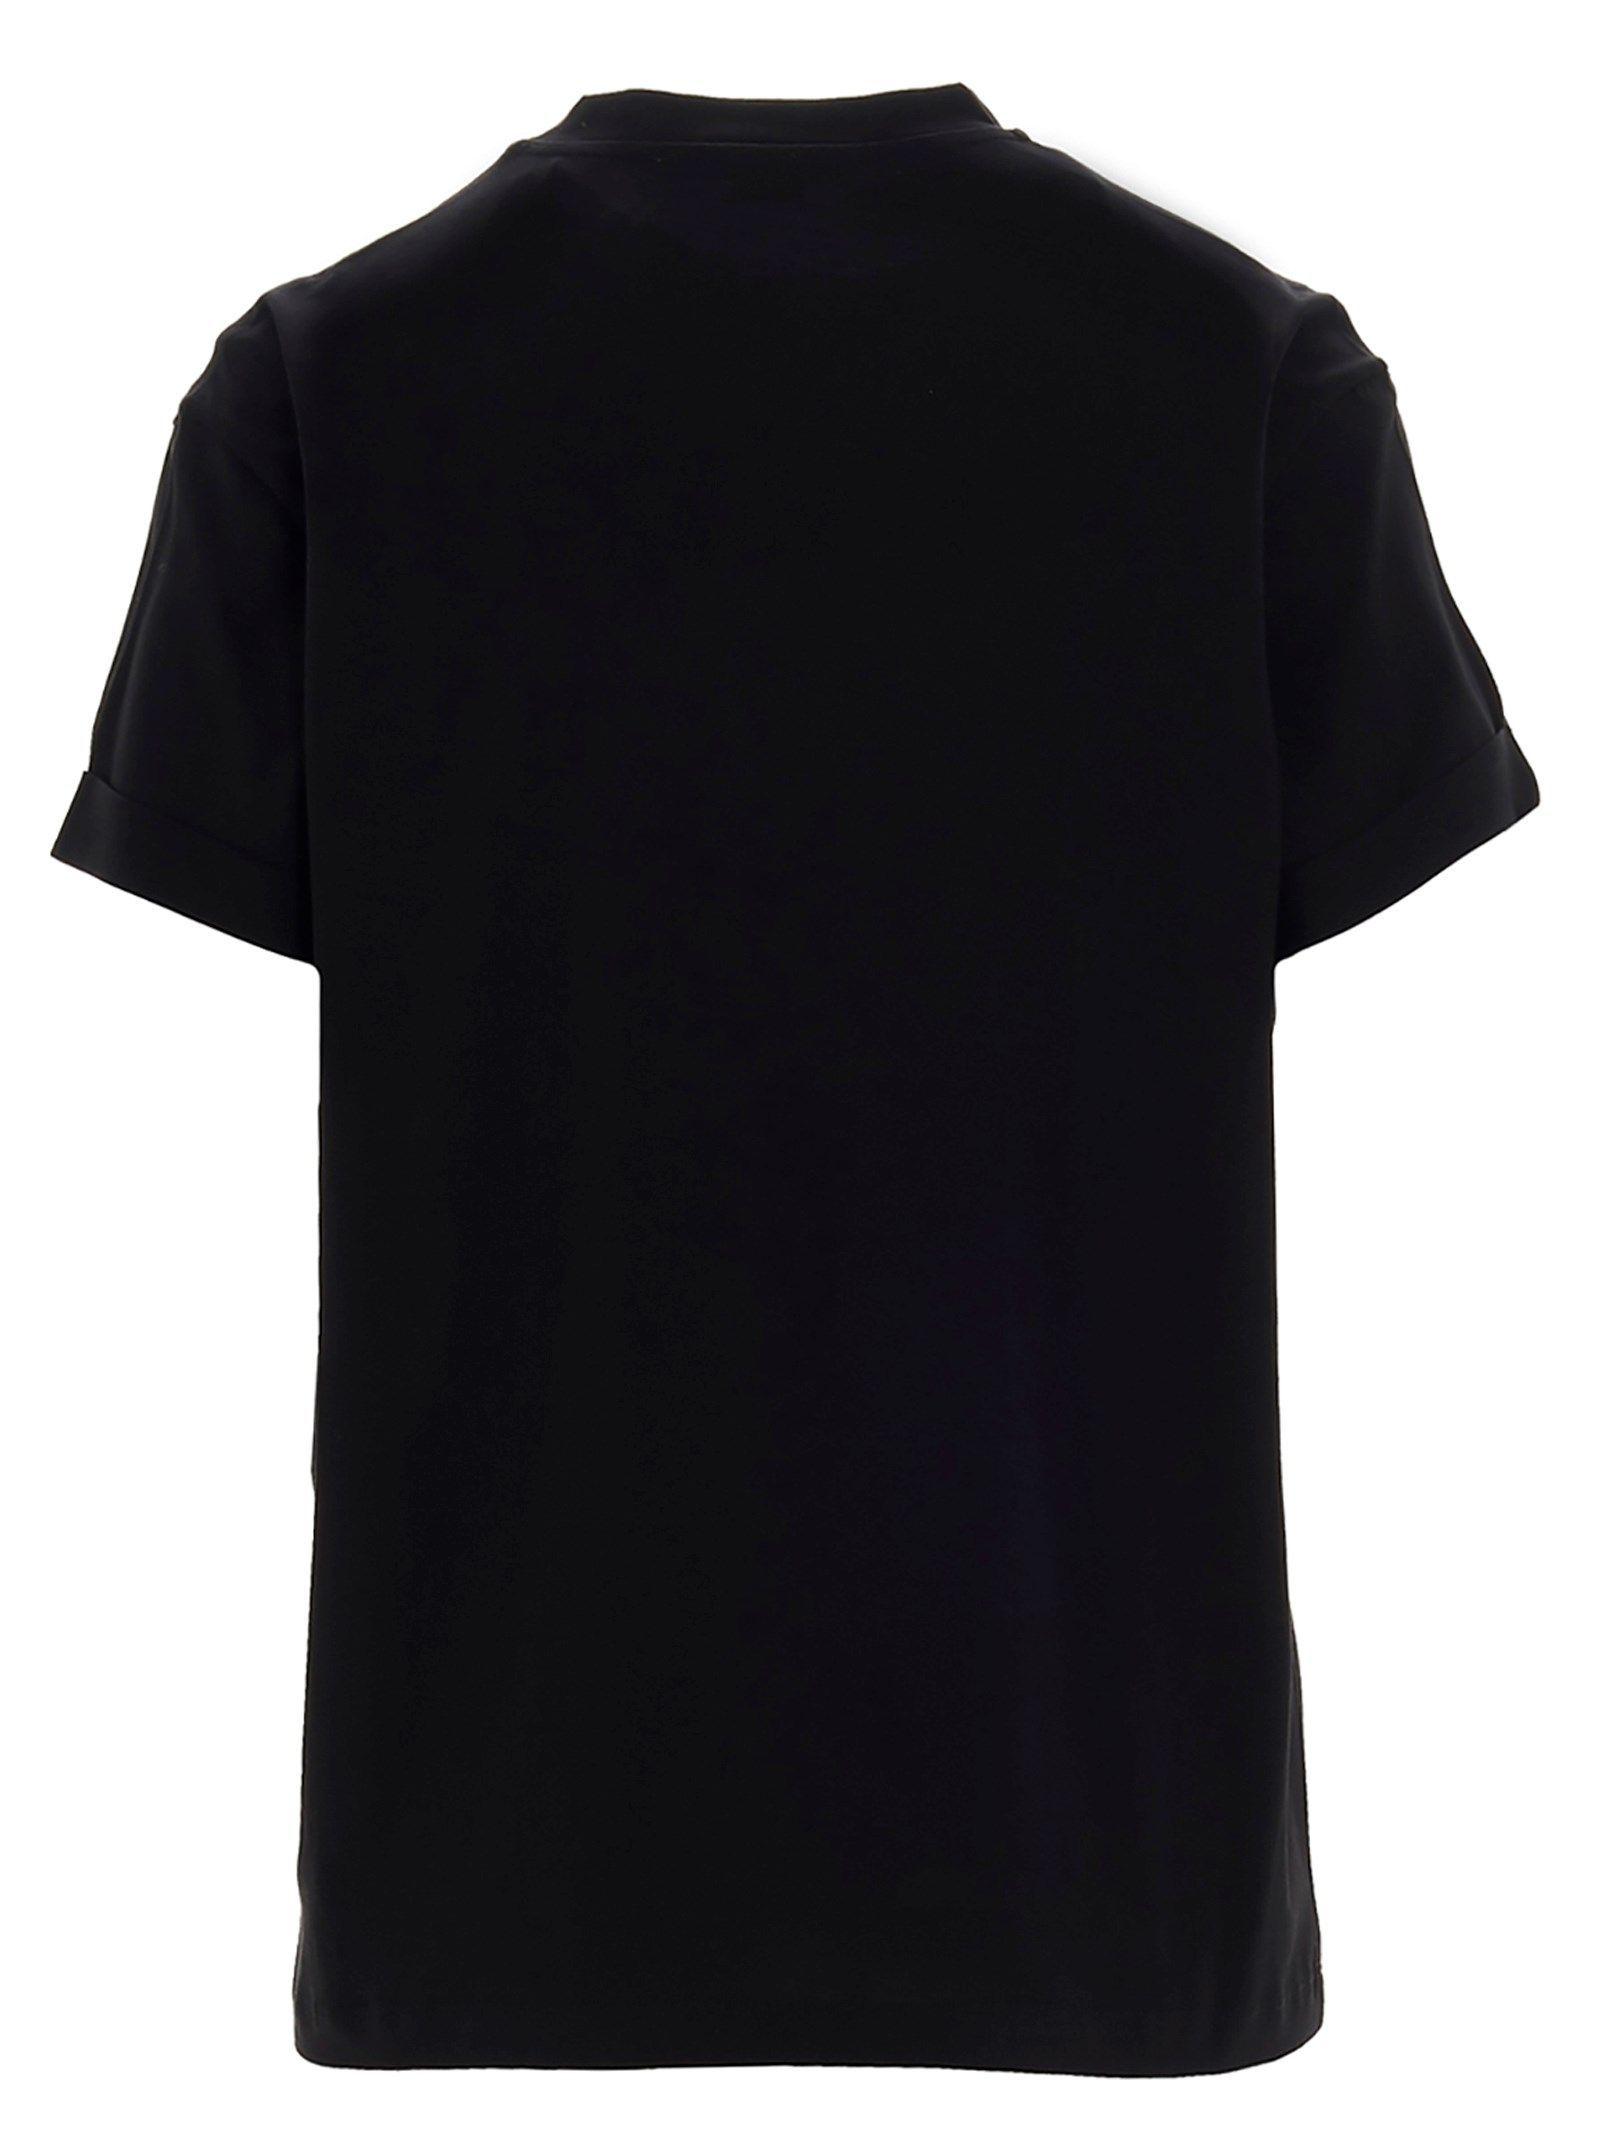 STELLA MCCARTNEY WOMEN'S 457142SIW201000 BLACK COTTON T-SHIRT